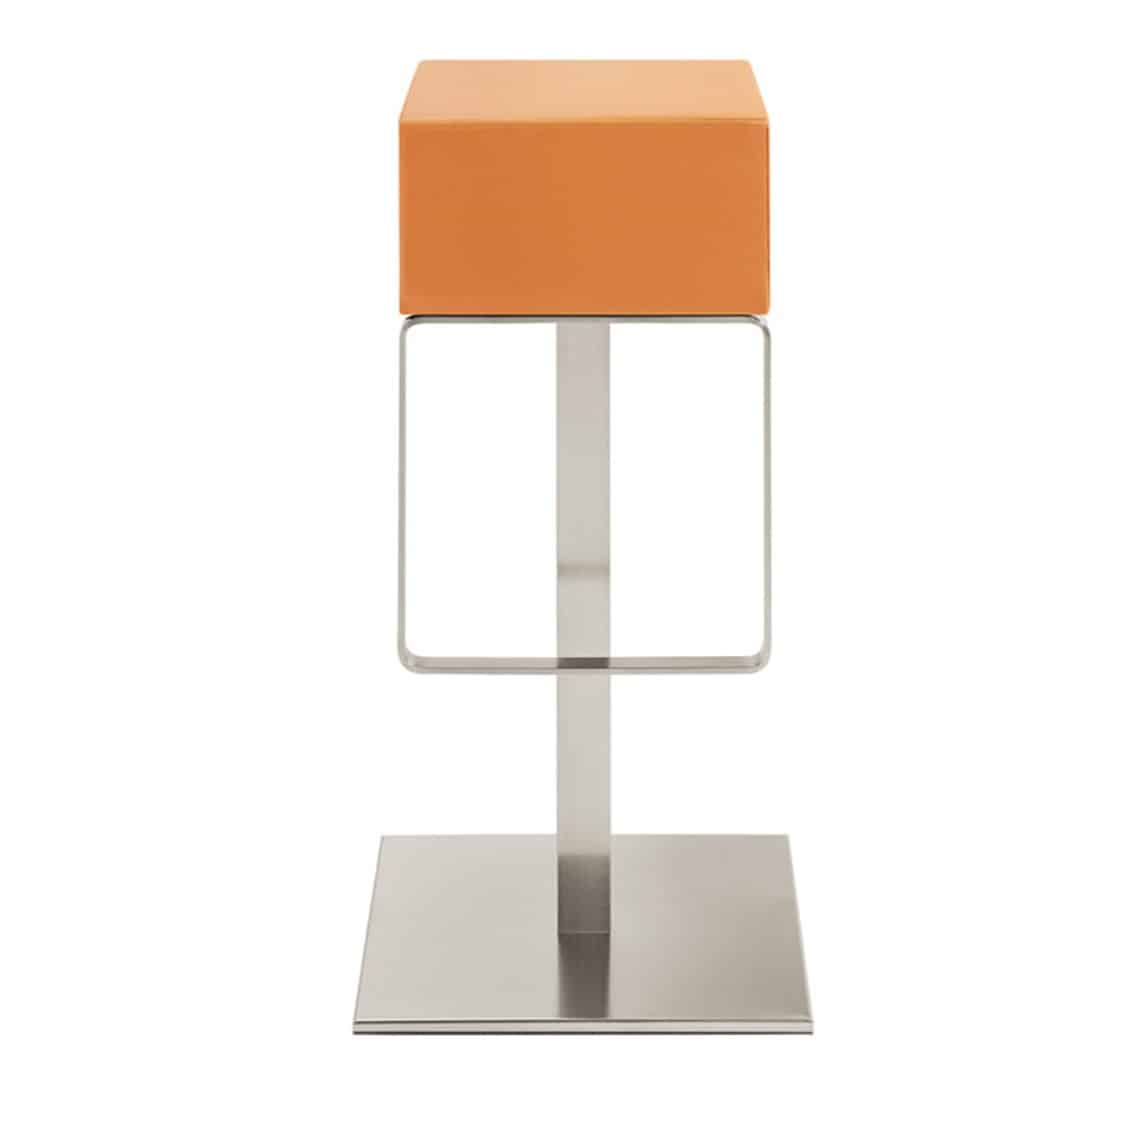 Dice Bar Stool HX 4445G Pedrali at DeFrae Contract Furniture